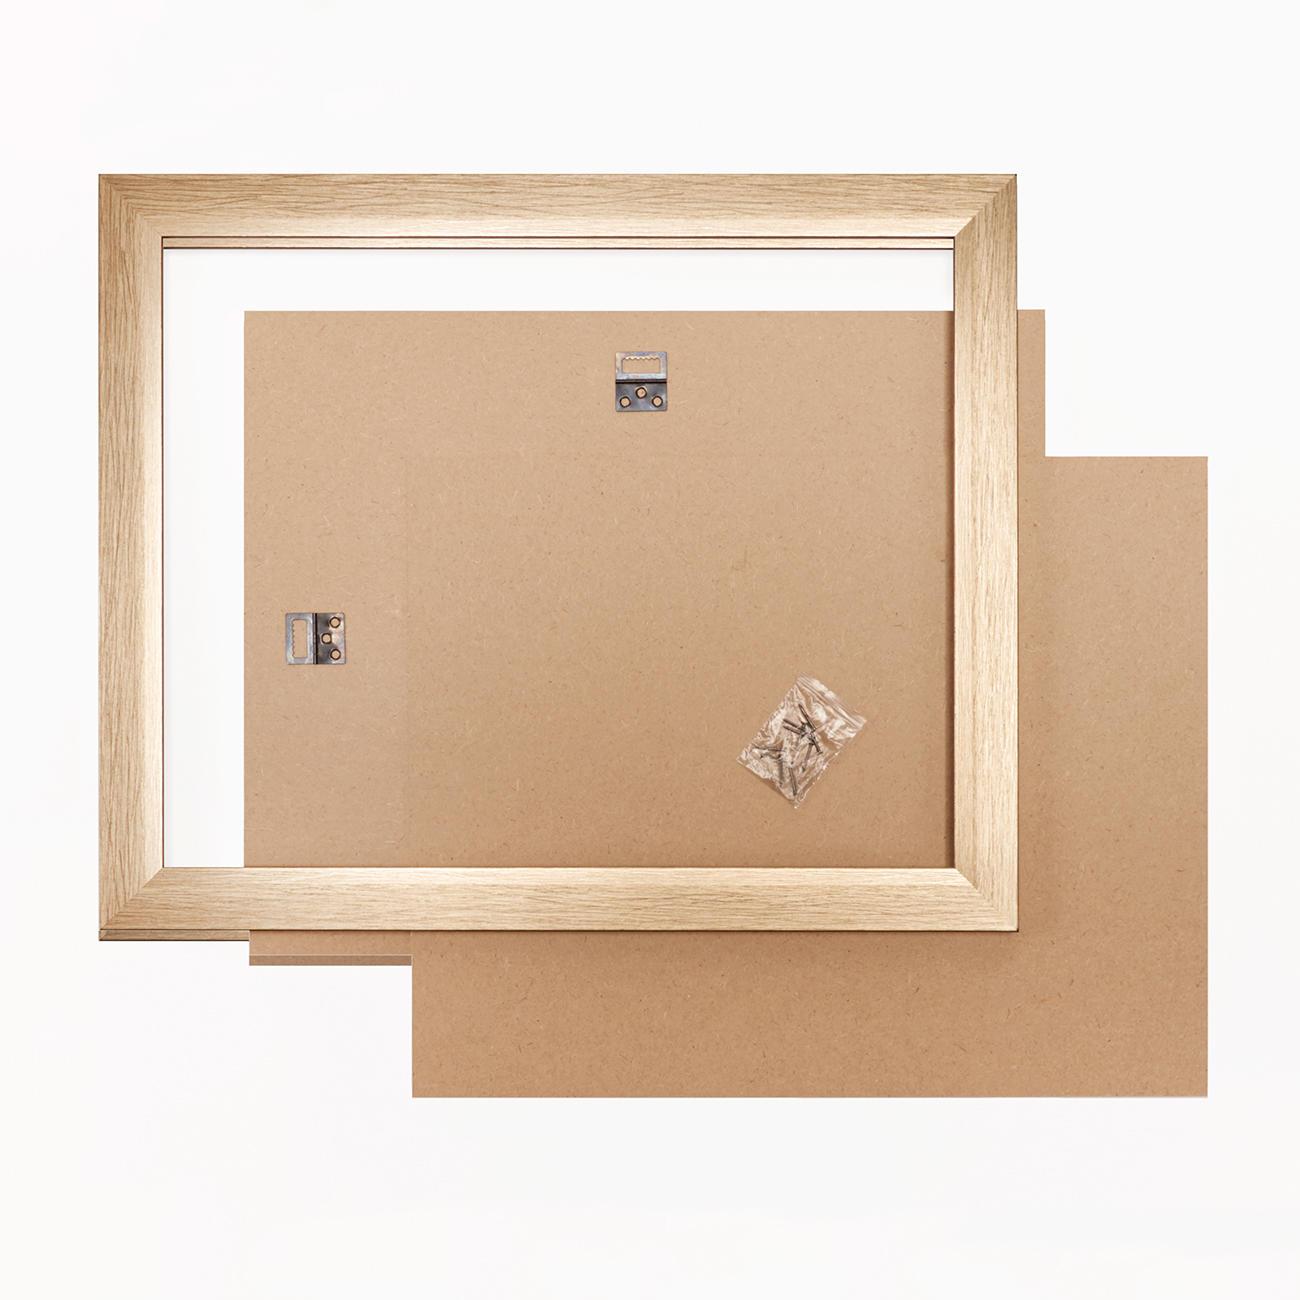 bilderrahmen blass goldfarben verschiedene gr en. Black Bedroom Furniture Sets. Home Design Ideas